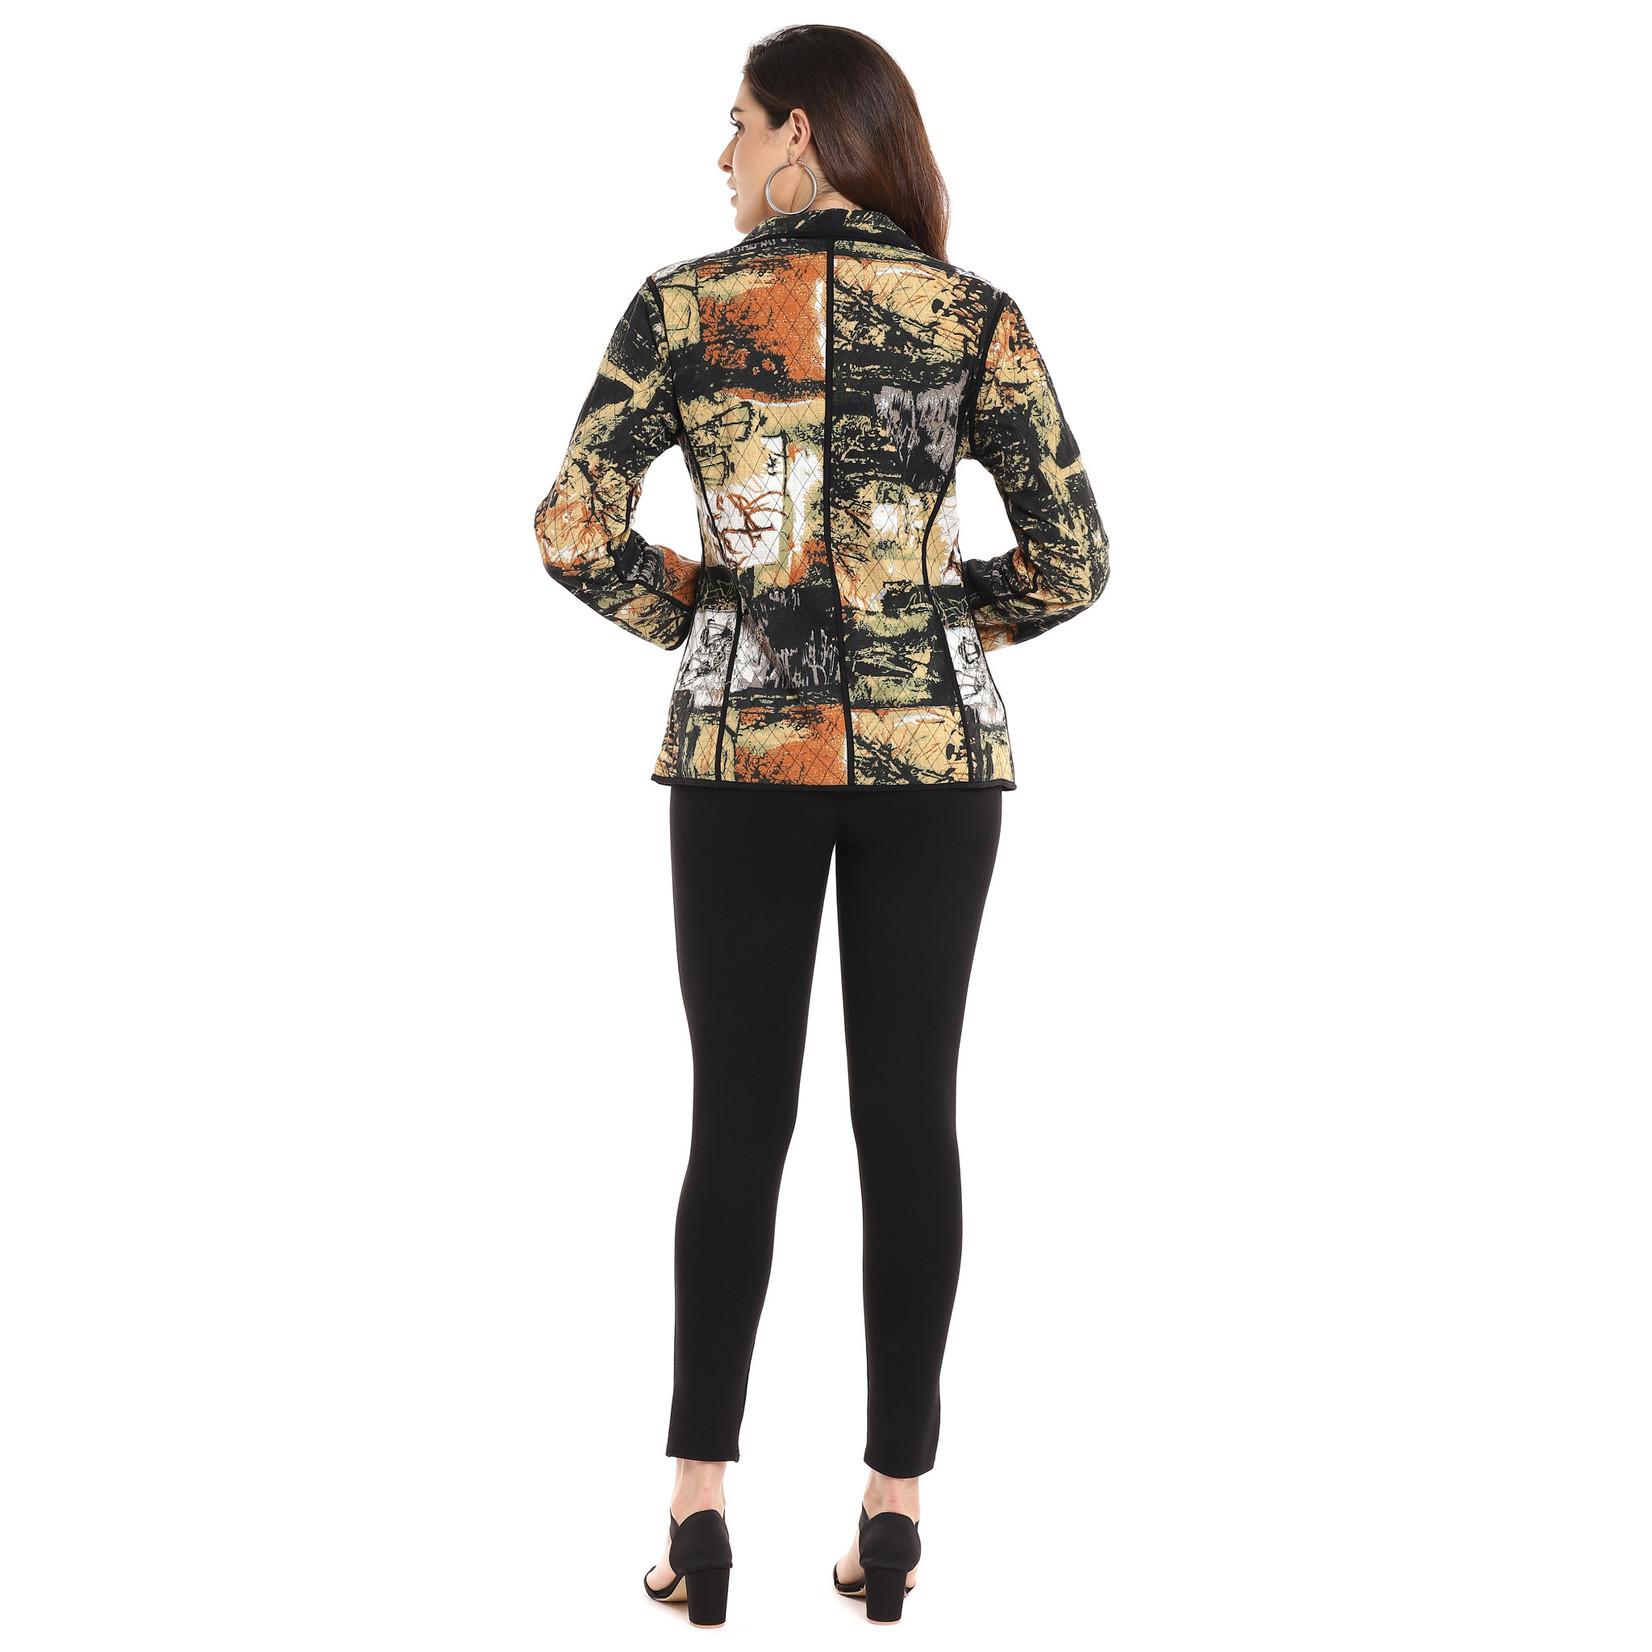 Parsley and Sage Talia Reversible Jacket